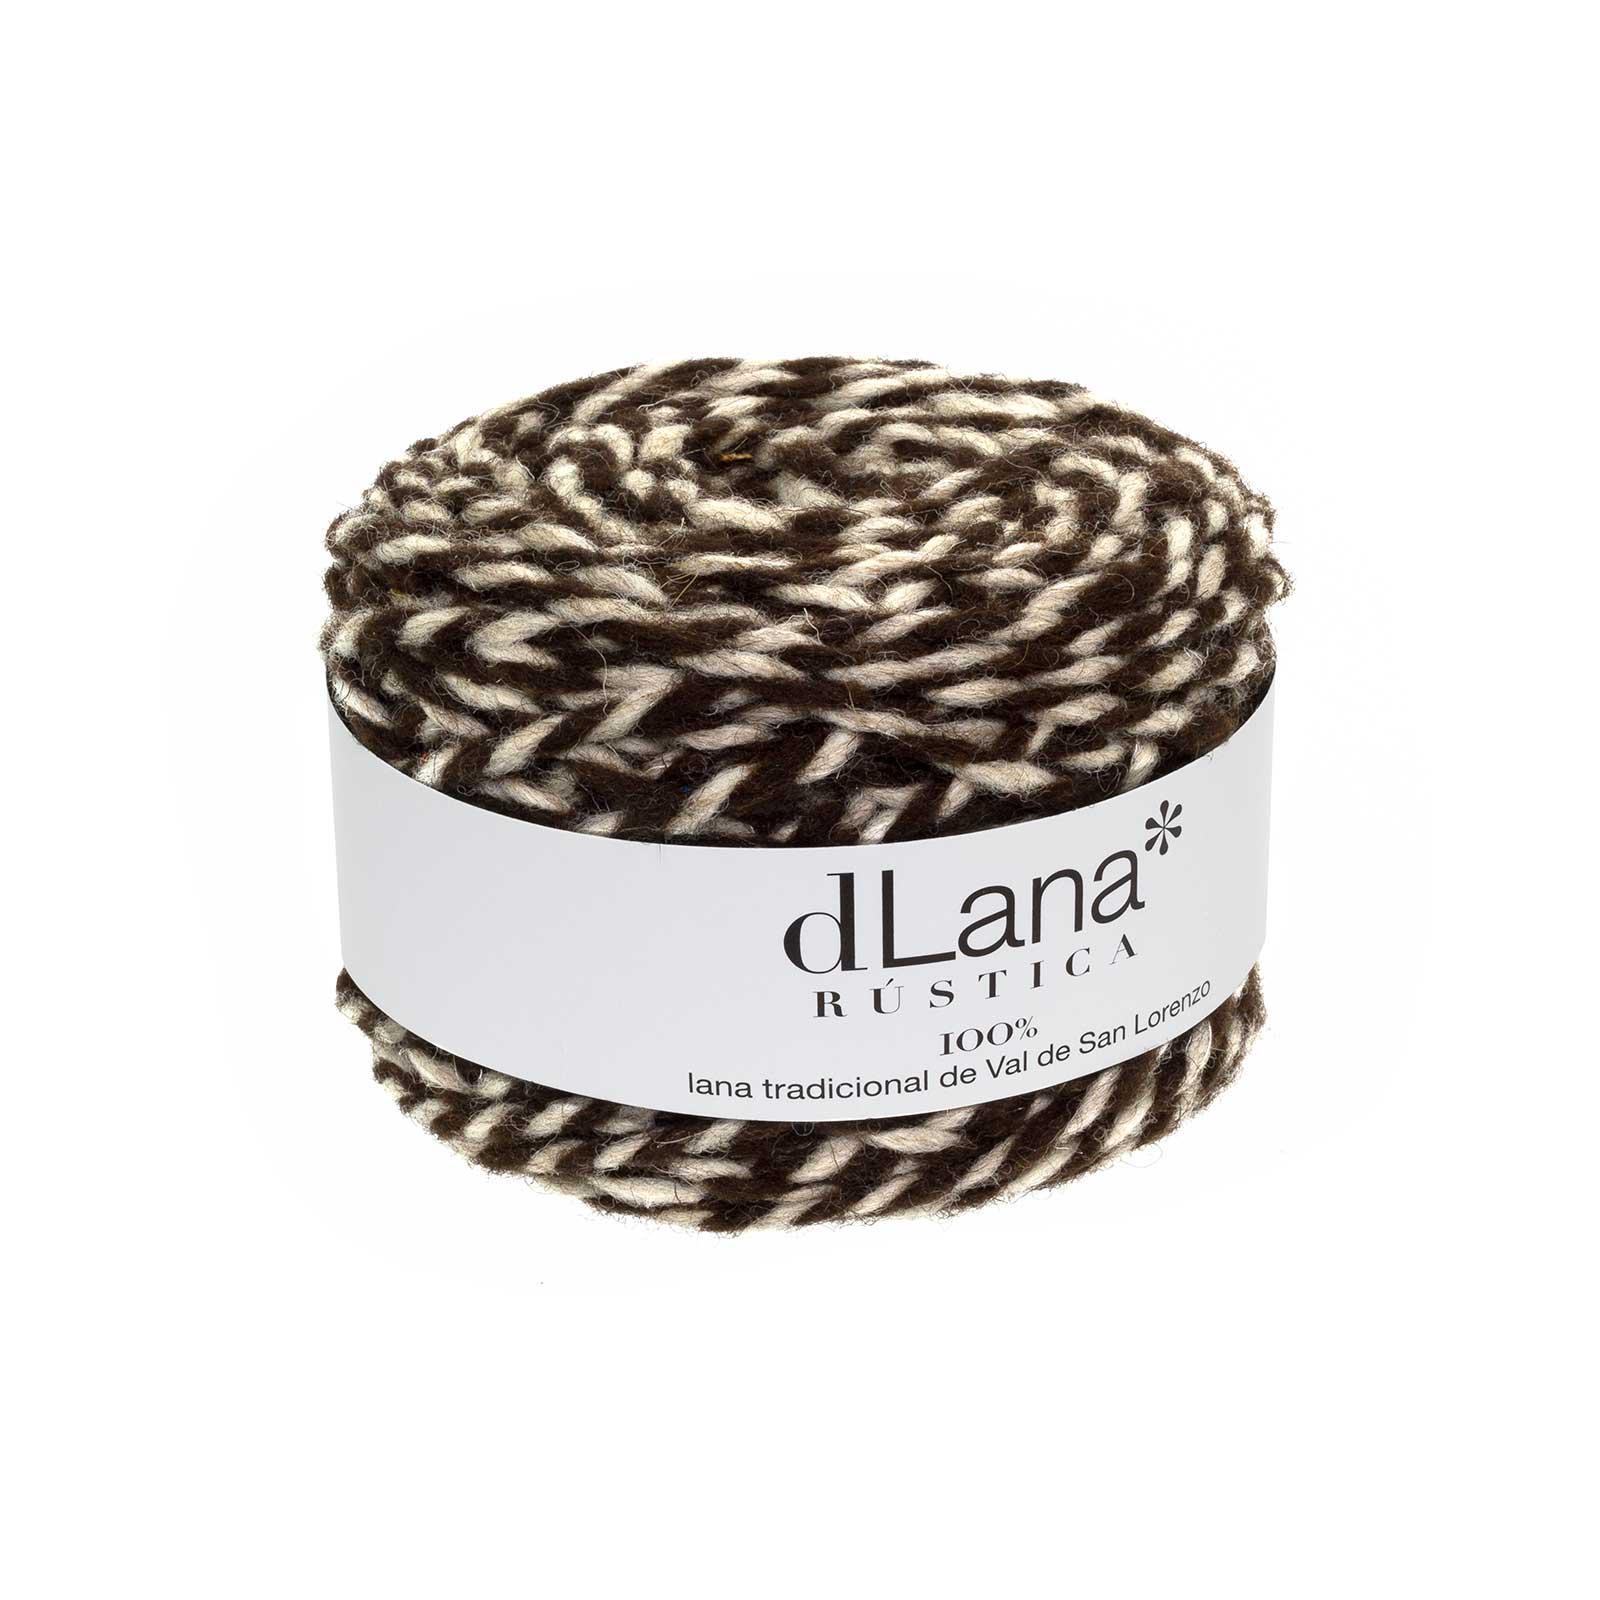 Ovillo de lana rústica de colores jaspeados a dos cabos